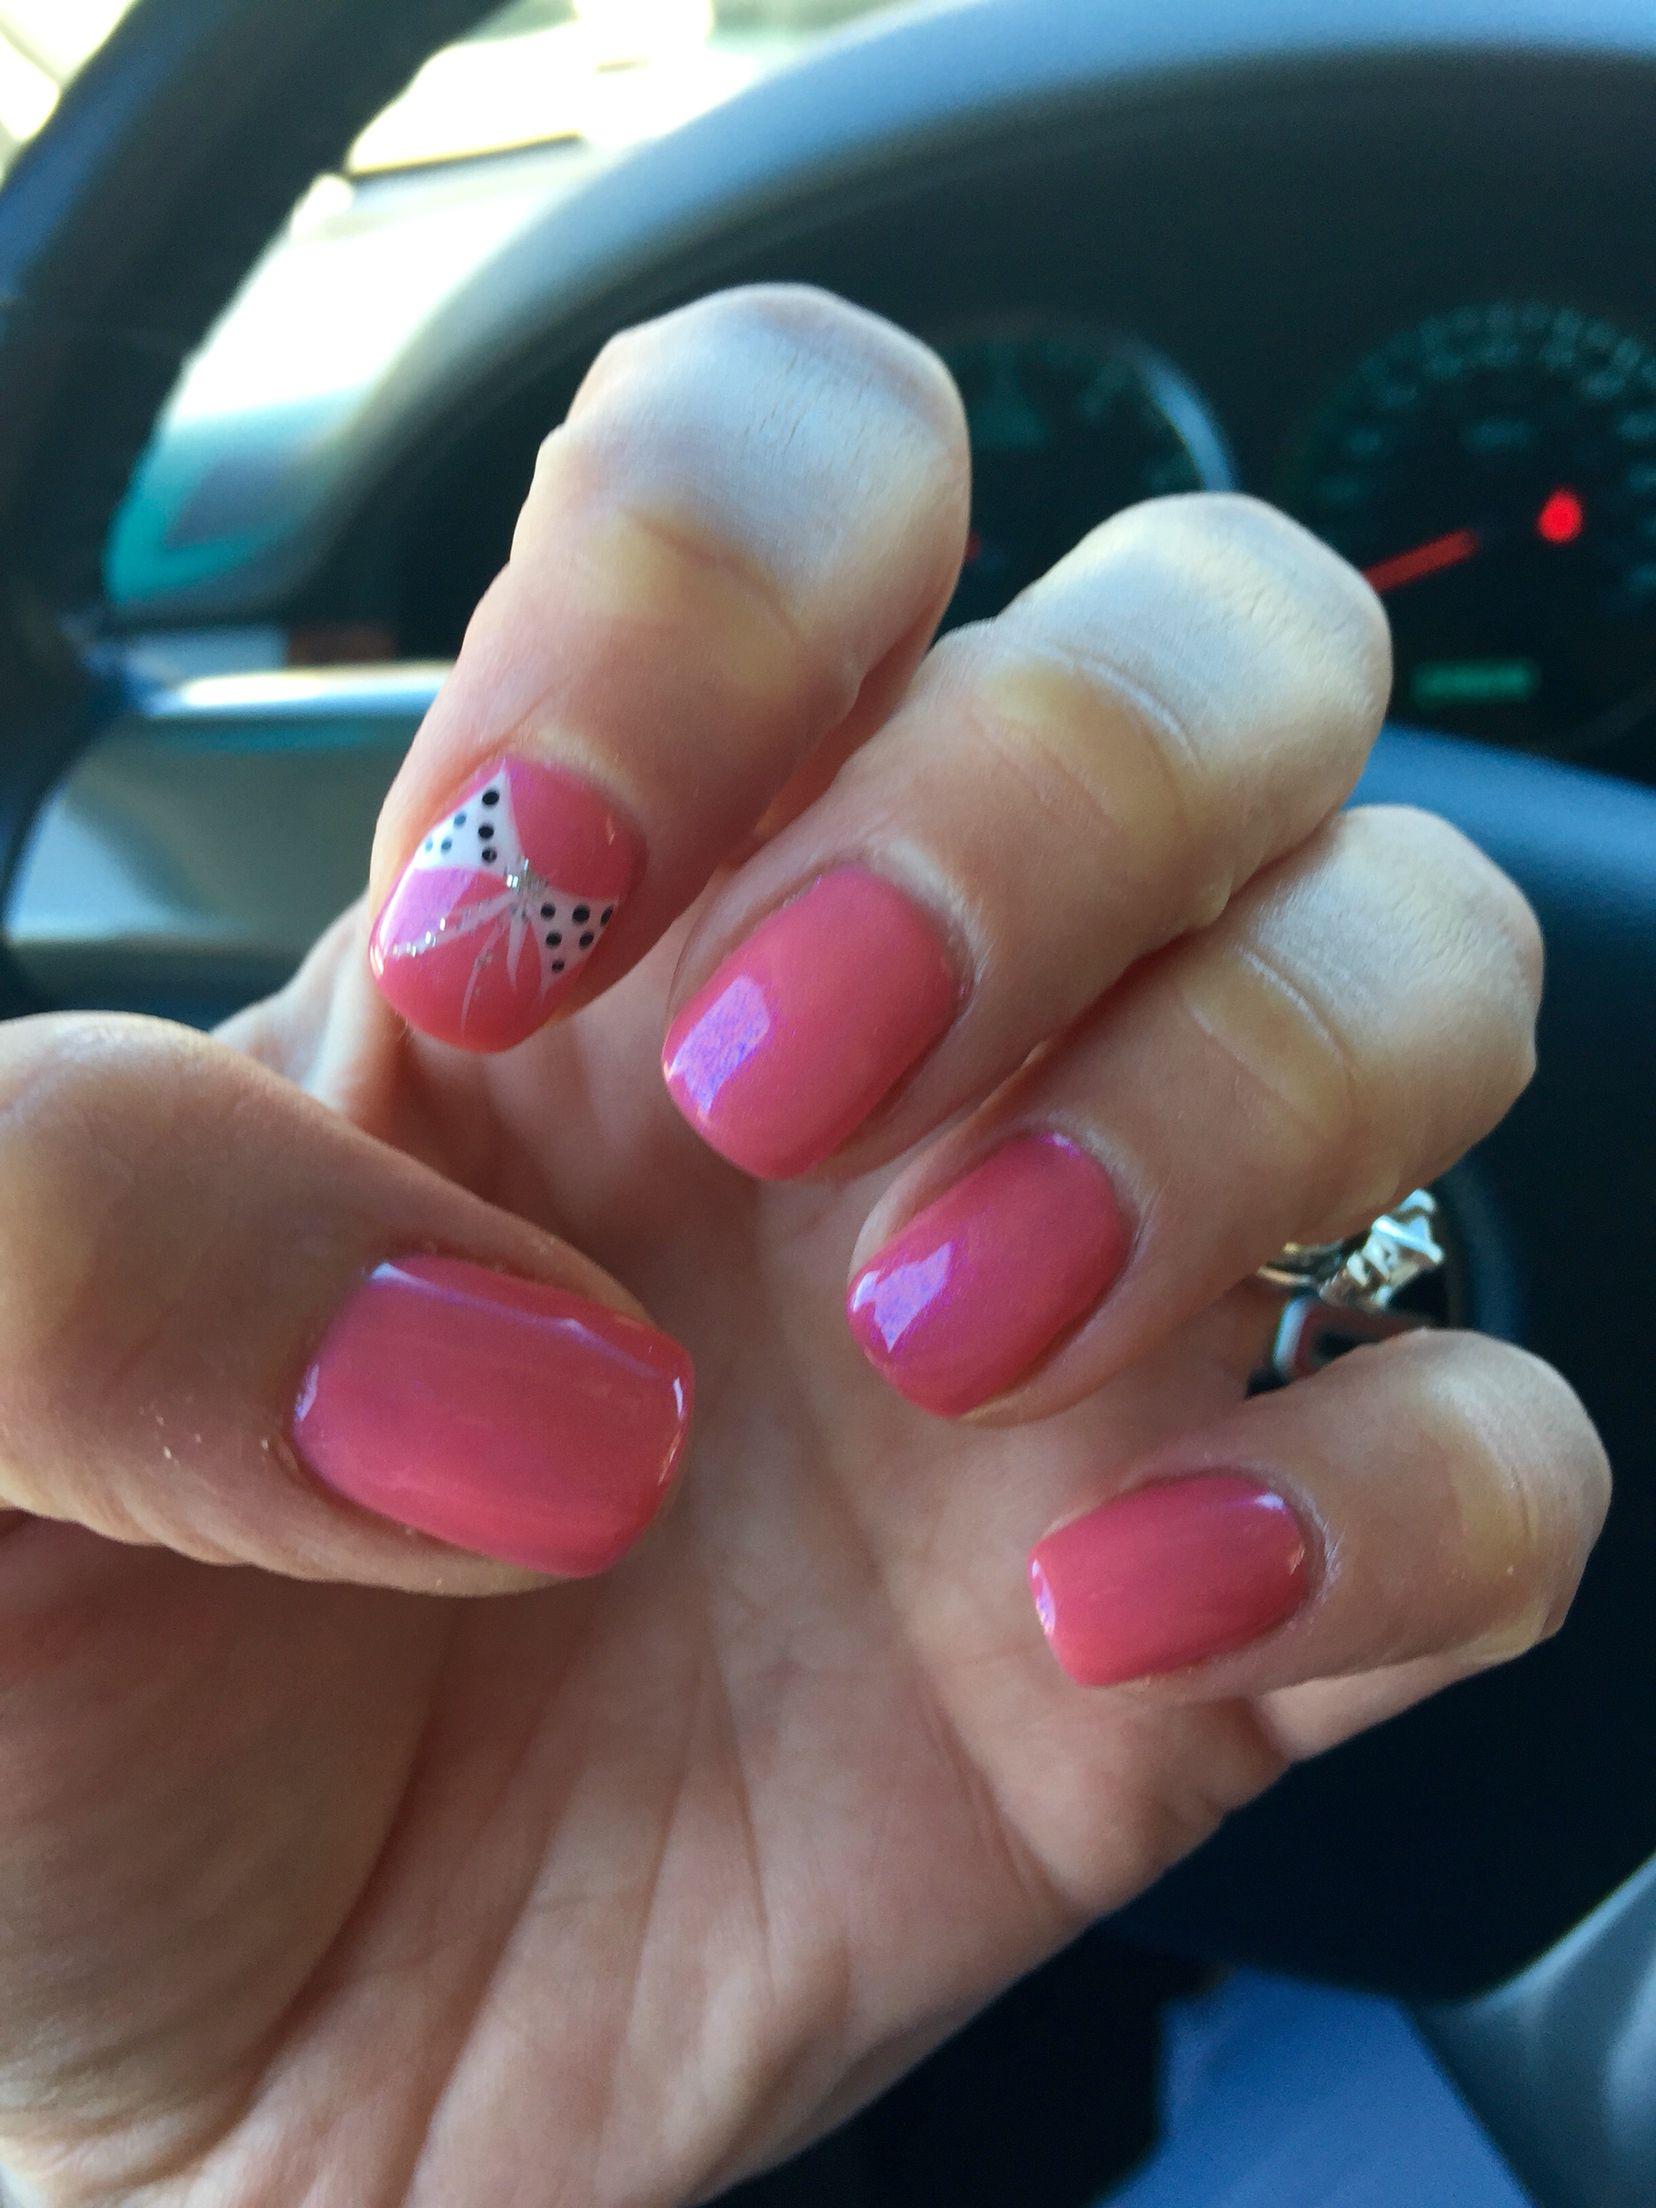 Nail Design Shellac Gellish Nail Art Bows Pretty Pink Summer